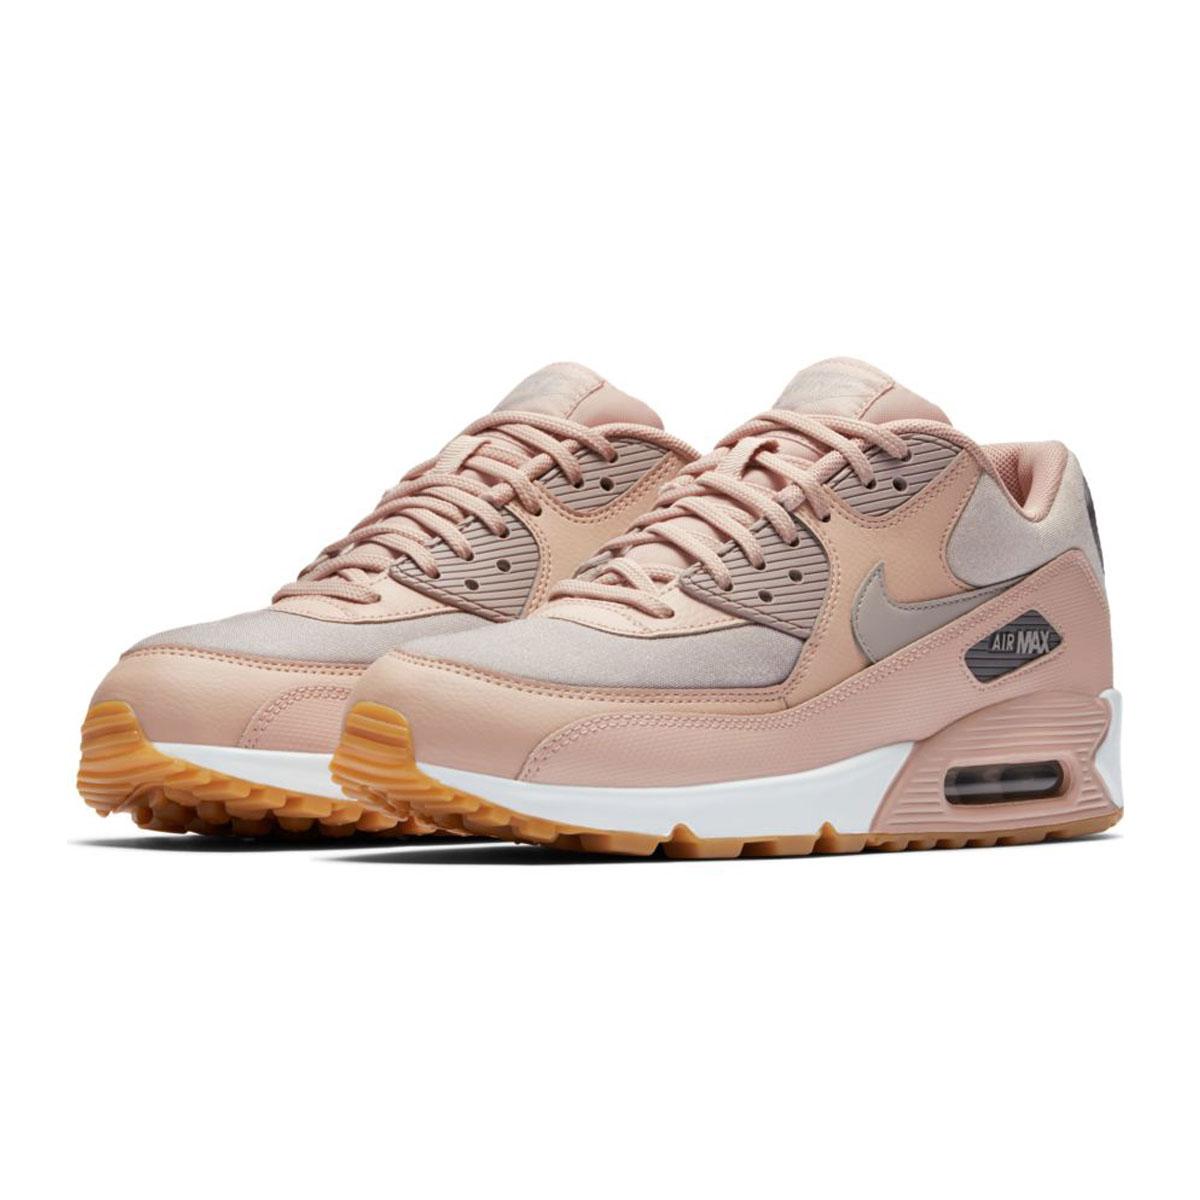 best sneakers cd203 ac590 NIKE WMNS AIR MAX 90 (Nike women Air Max 90) PARTICLE BEIGE MOON ...